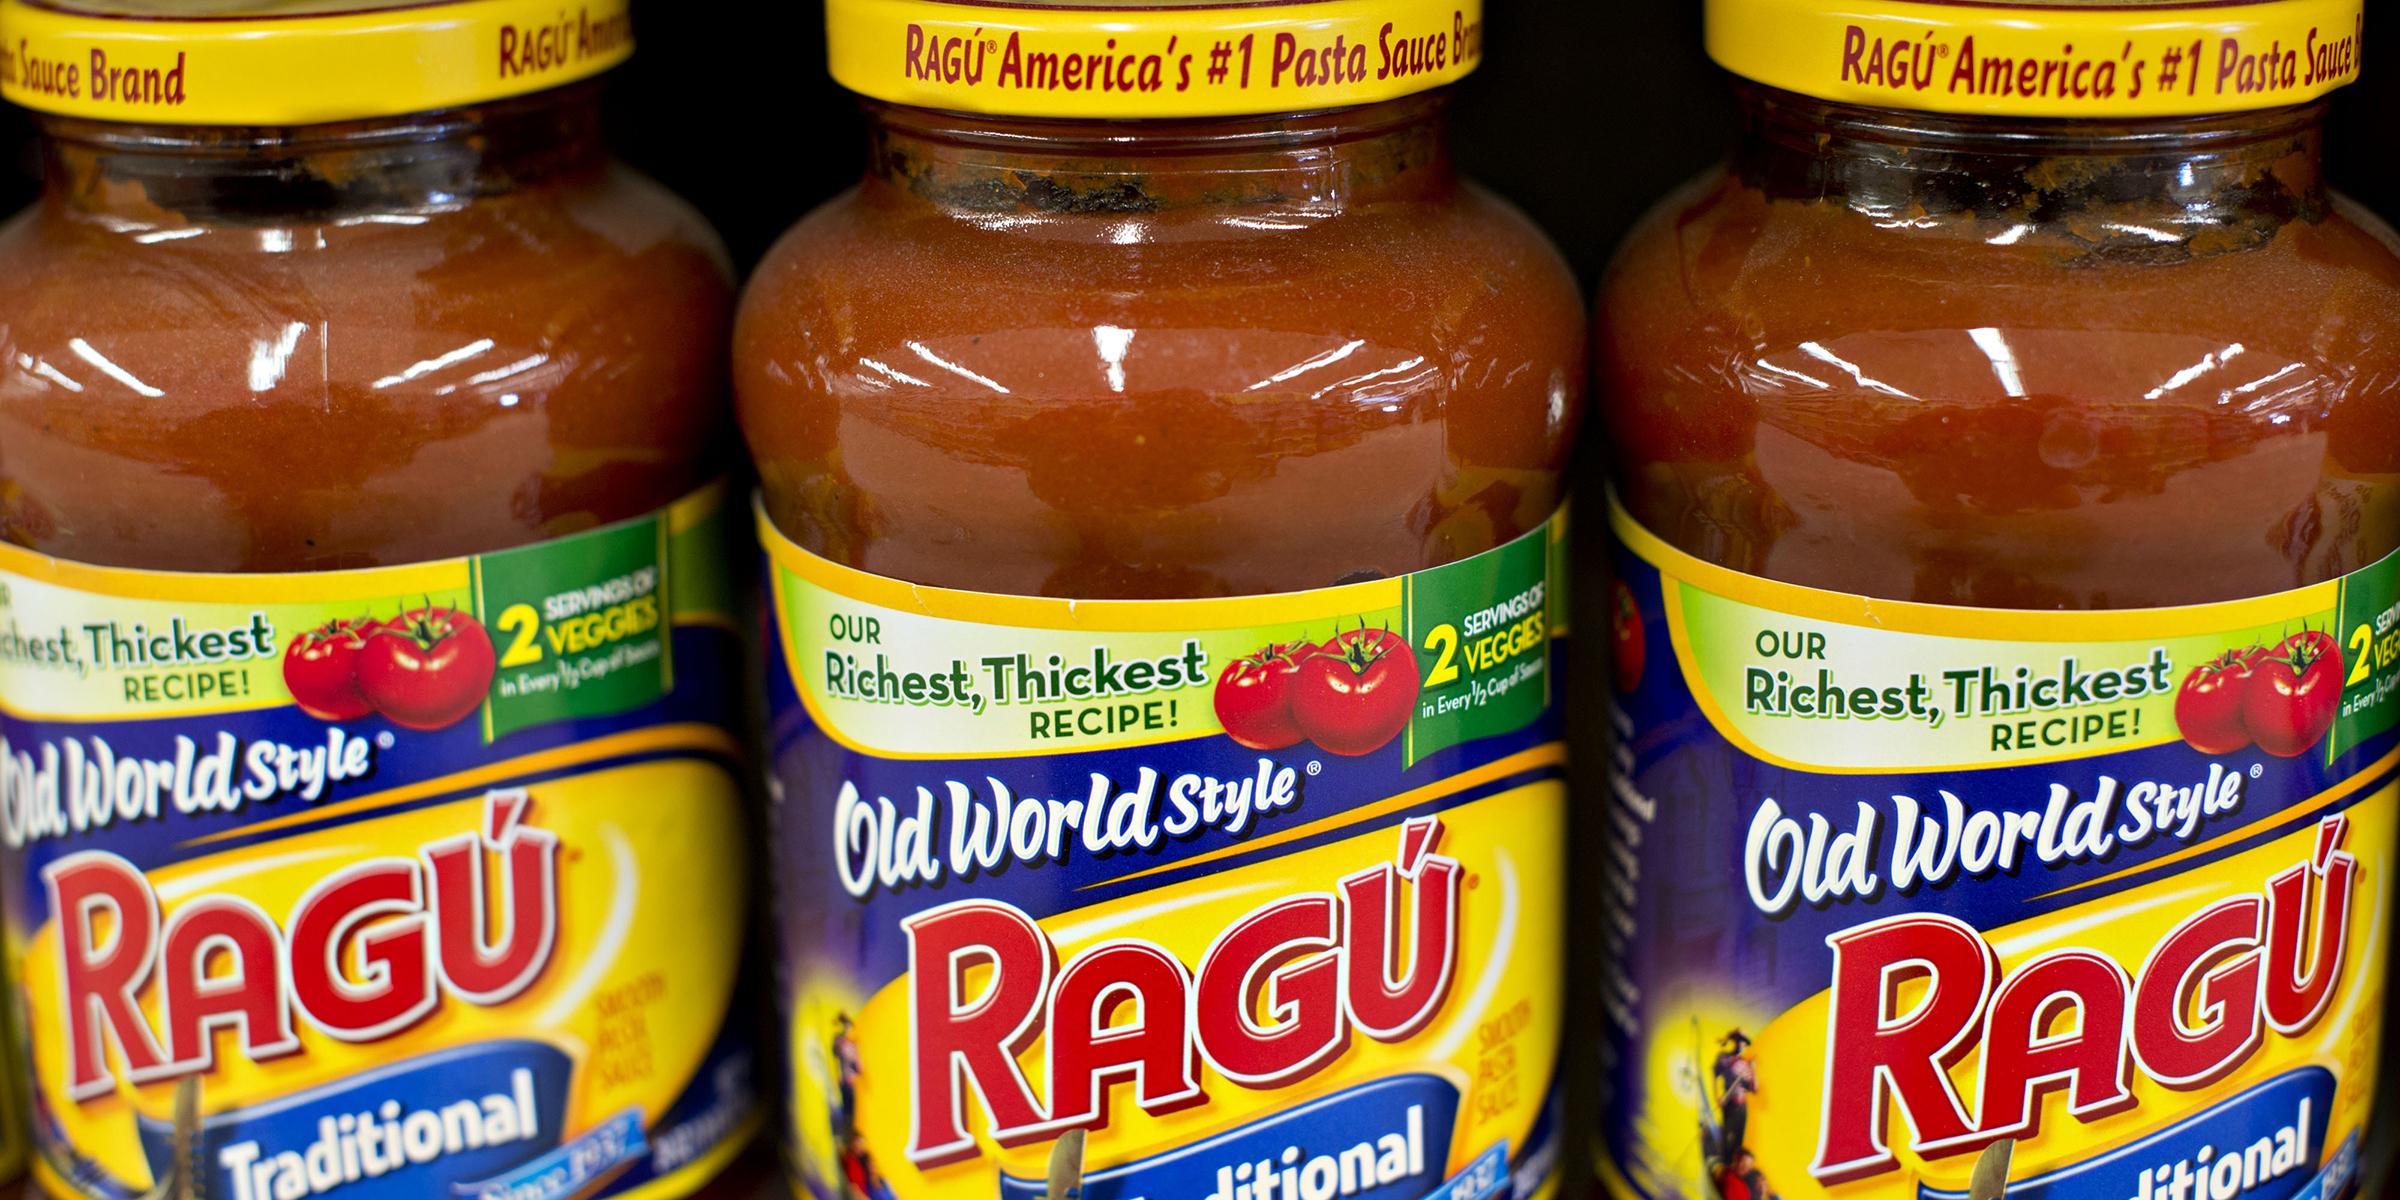 Ragu sauces